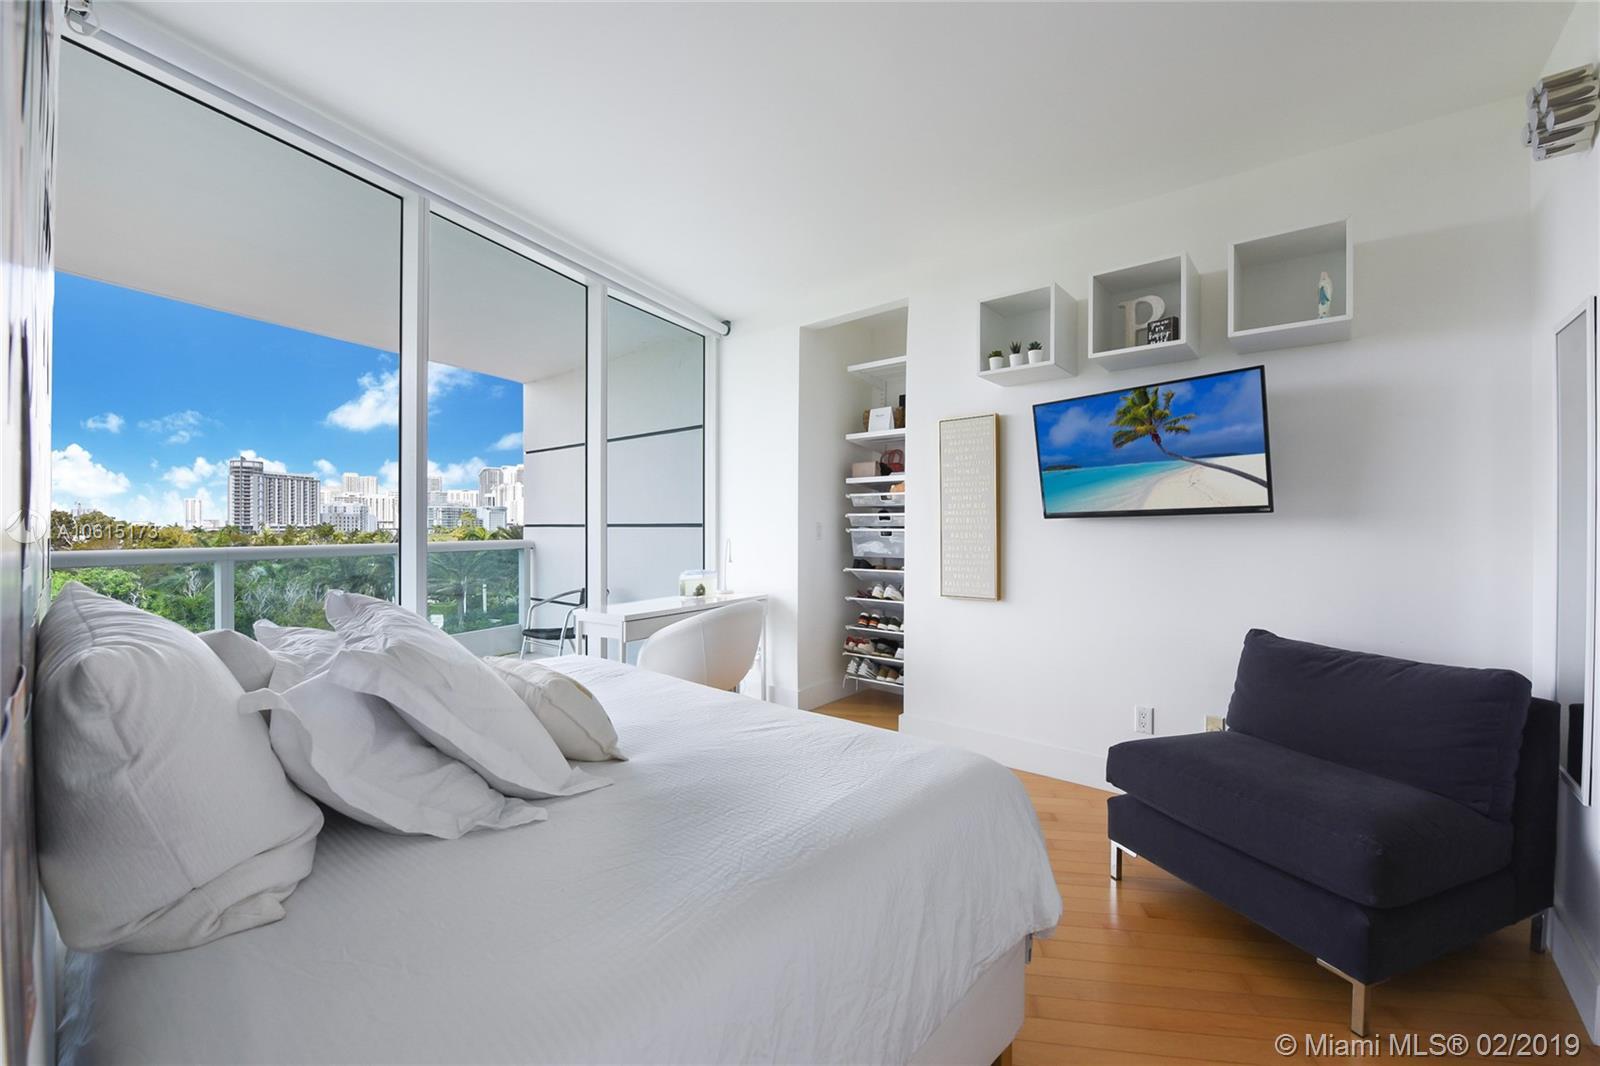 Аренда квартиры по адресу 2127 Brickell Ave, Miami, FL 33129 в США